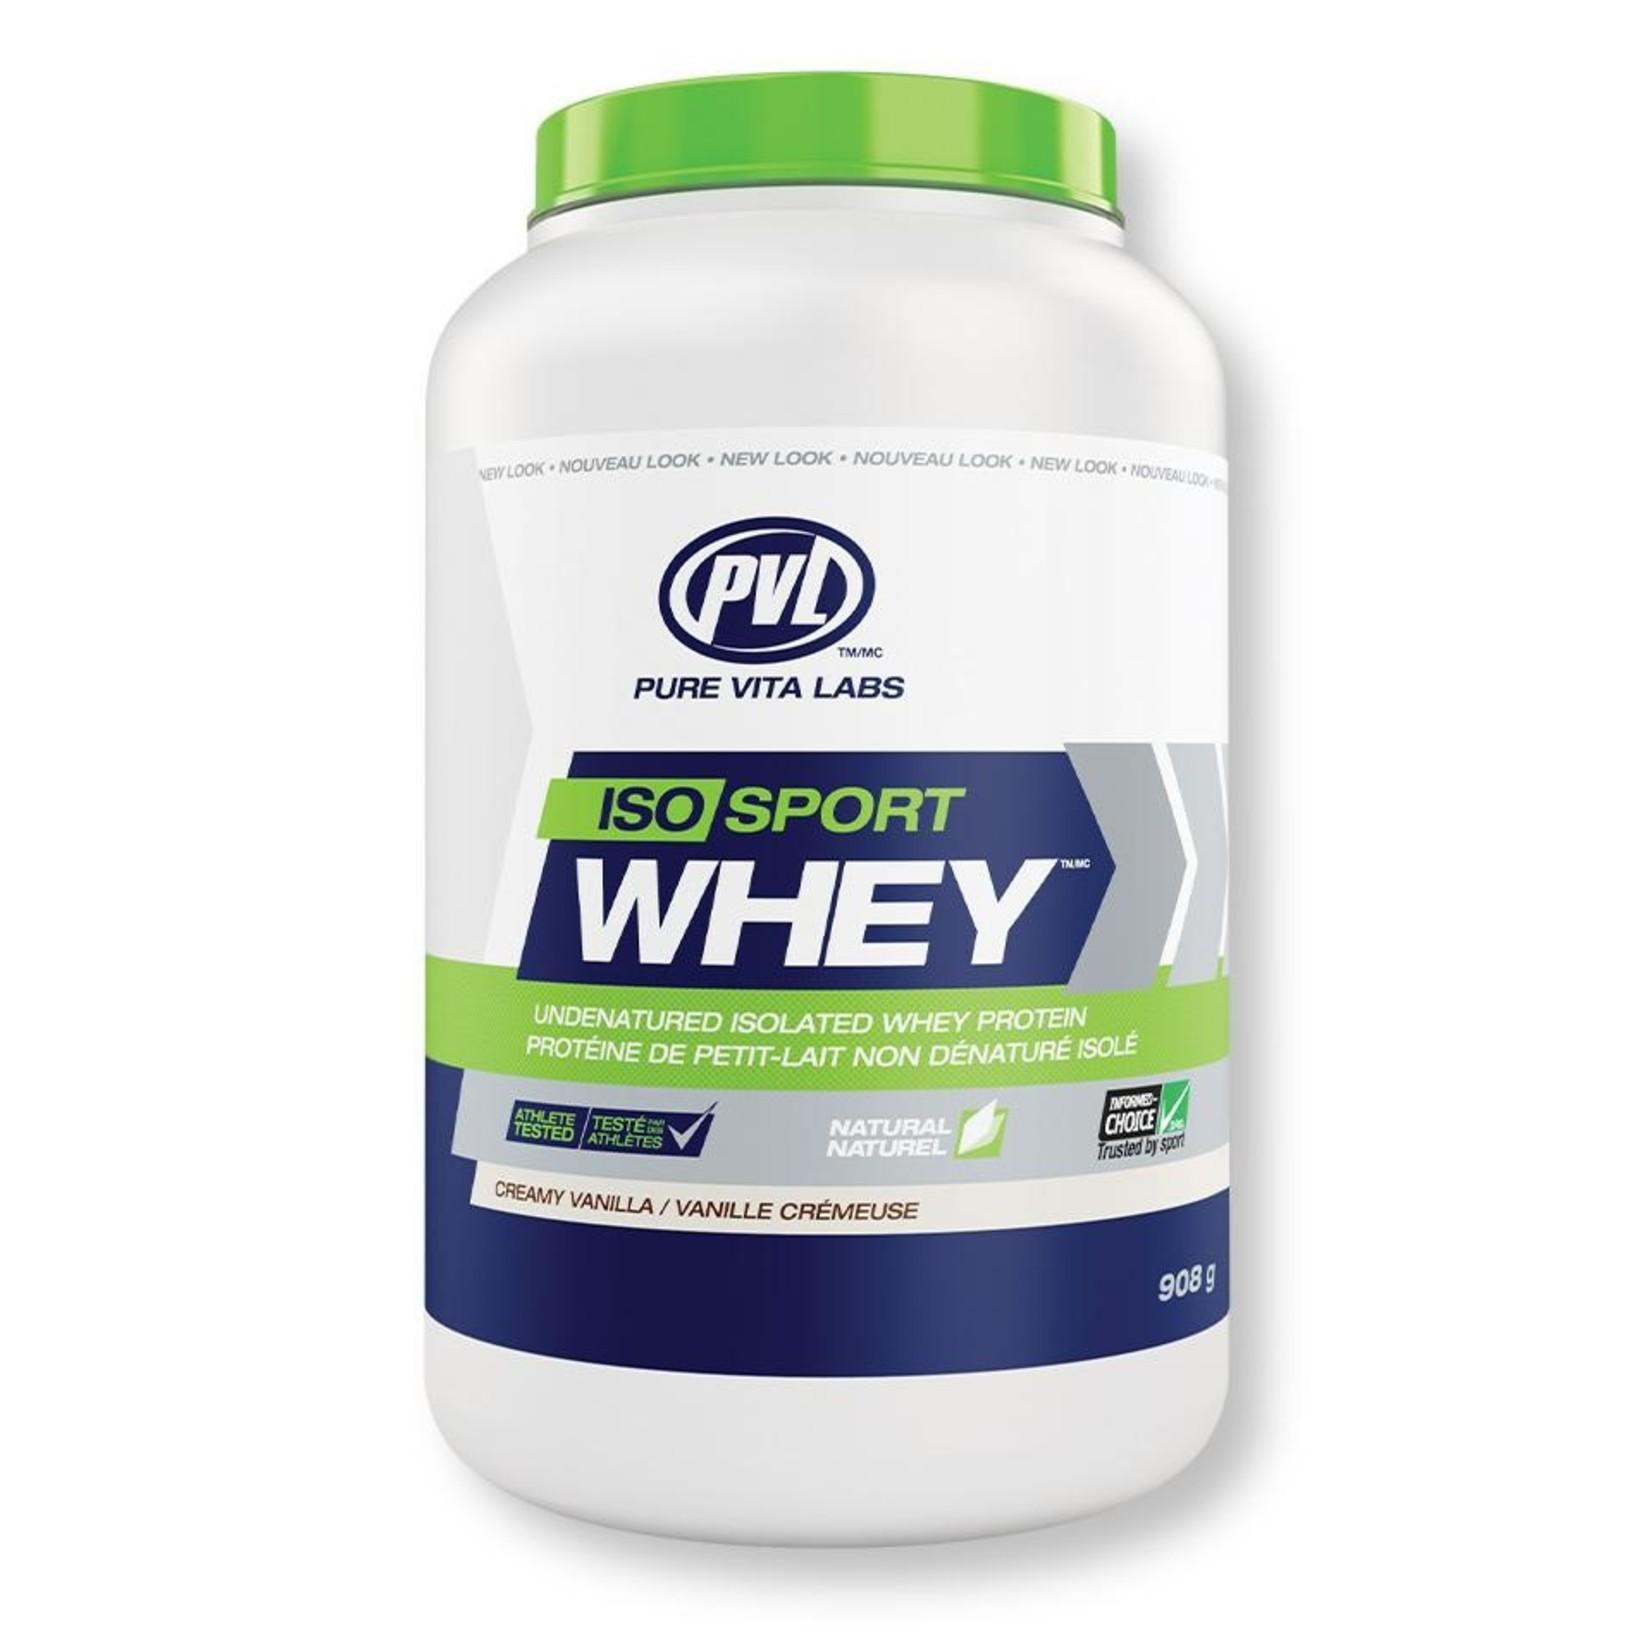 PVL PVL Iso Sport Whey Protein Creamy Vanilla 908g